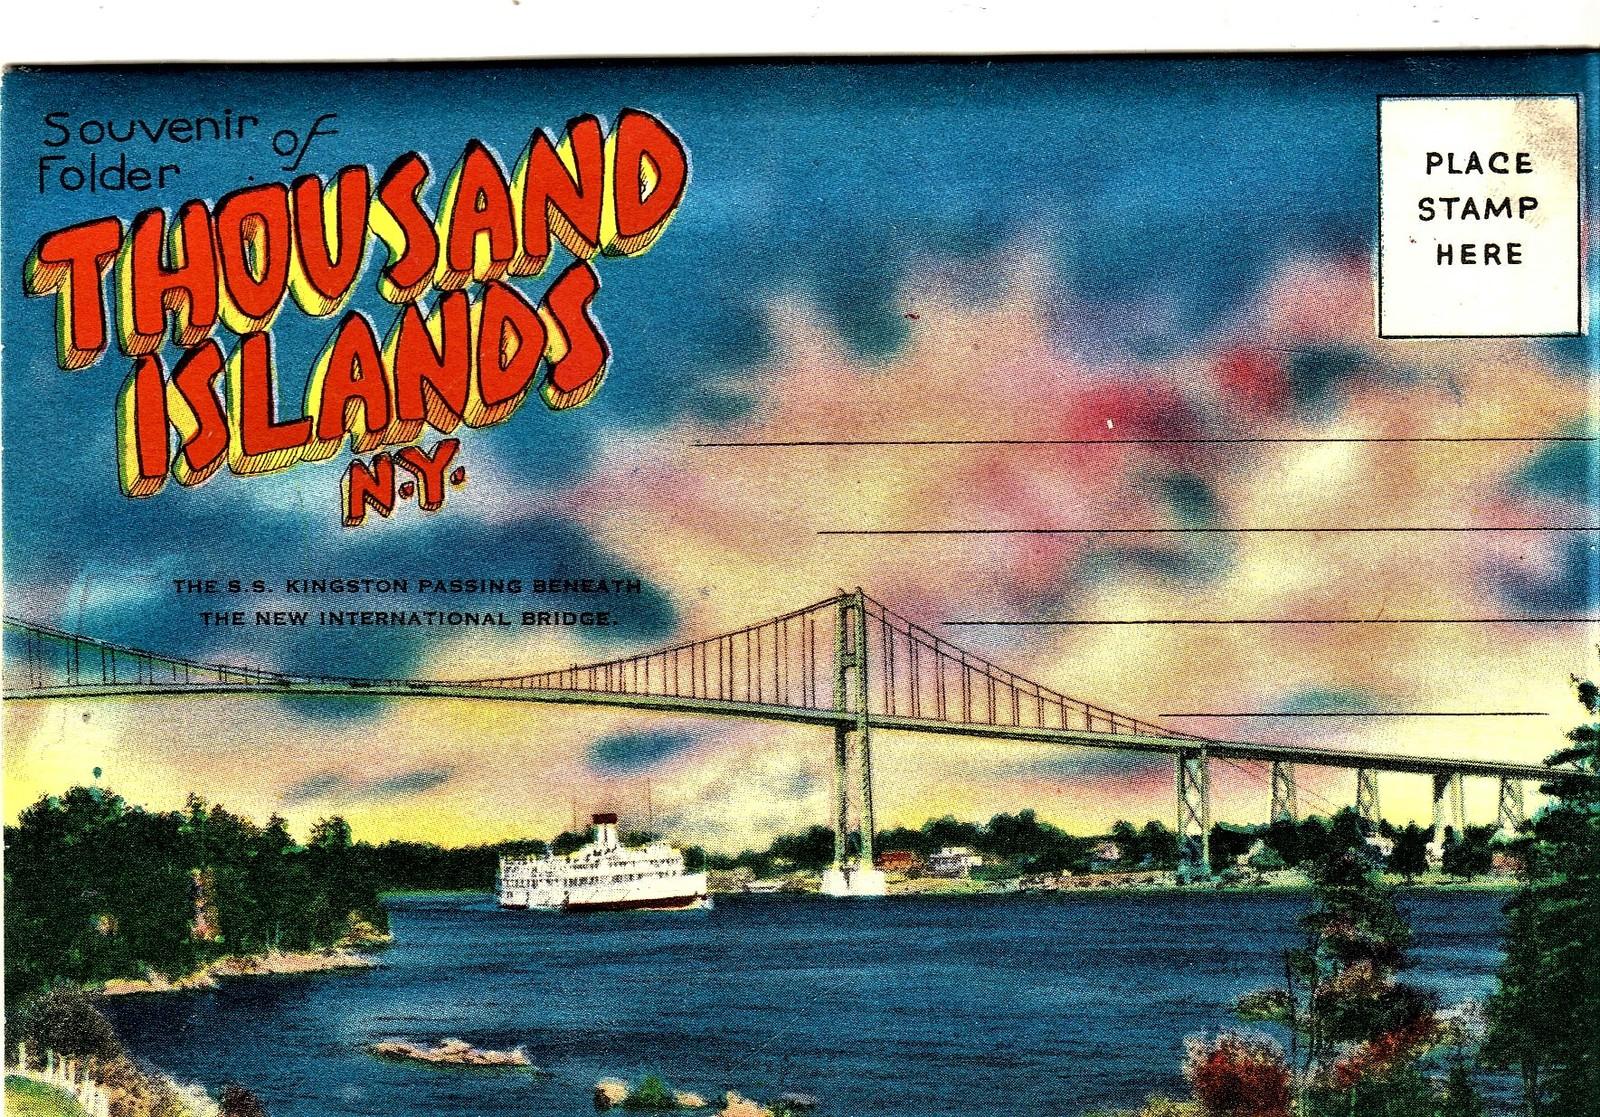 Thousand Islands Venice Of America Book & Souvenir Photo Booklet image 2